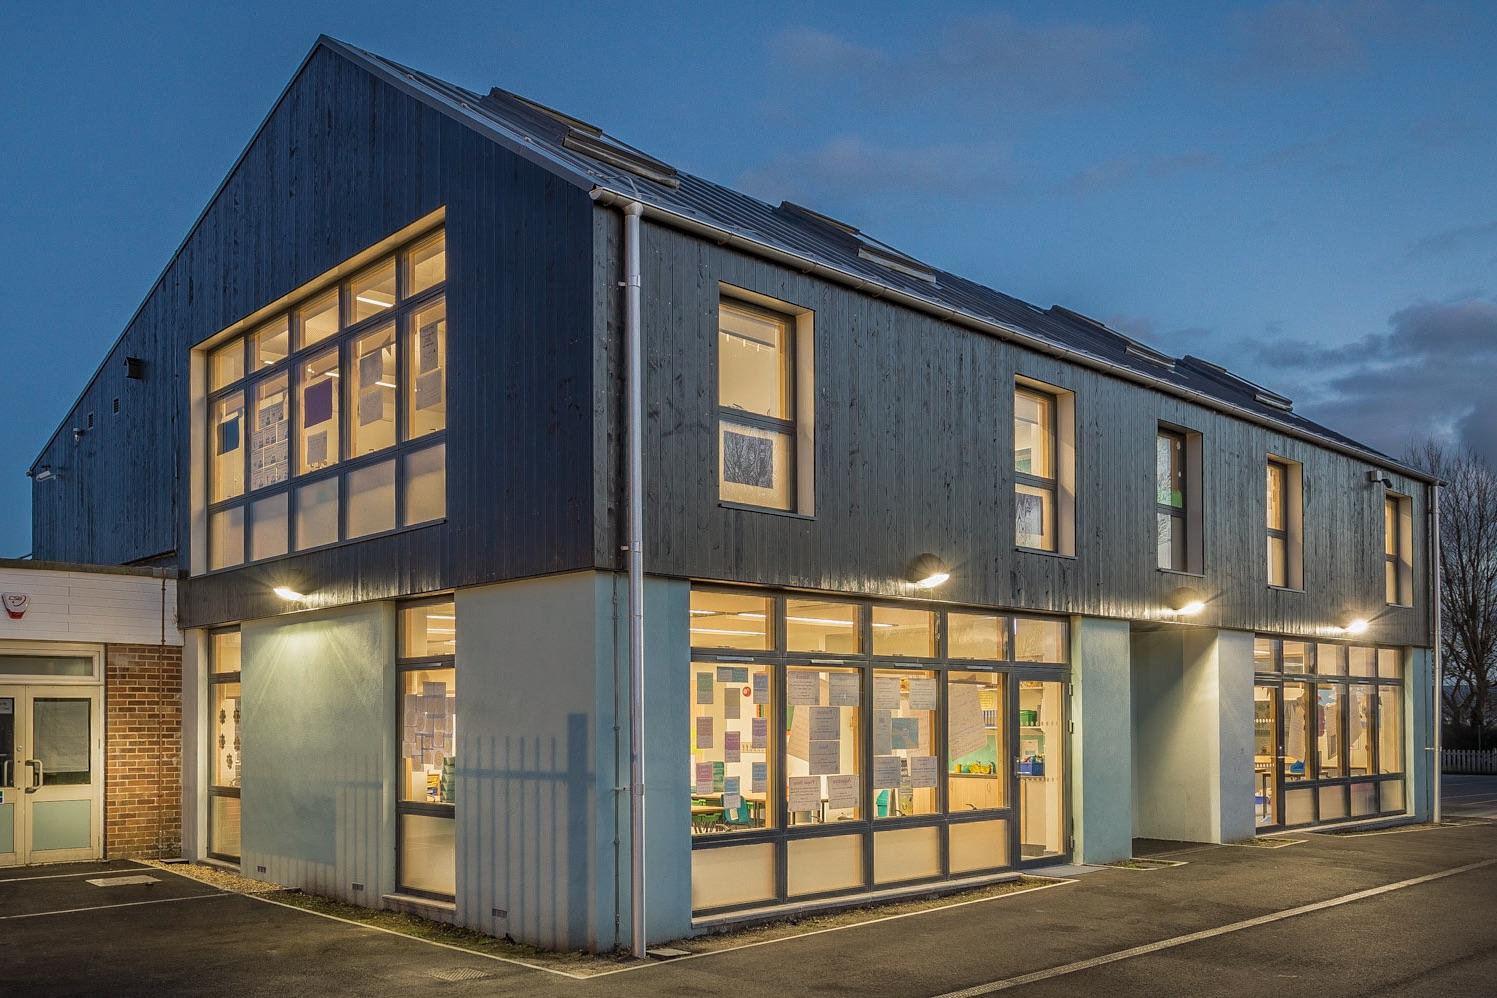 Hamworthy Park Junior School - architectural photography by Rick McEvoy